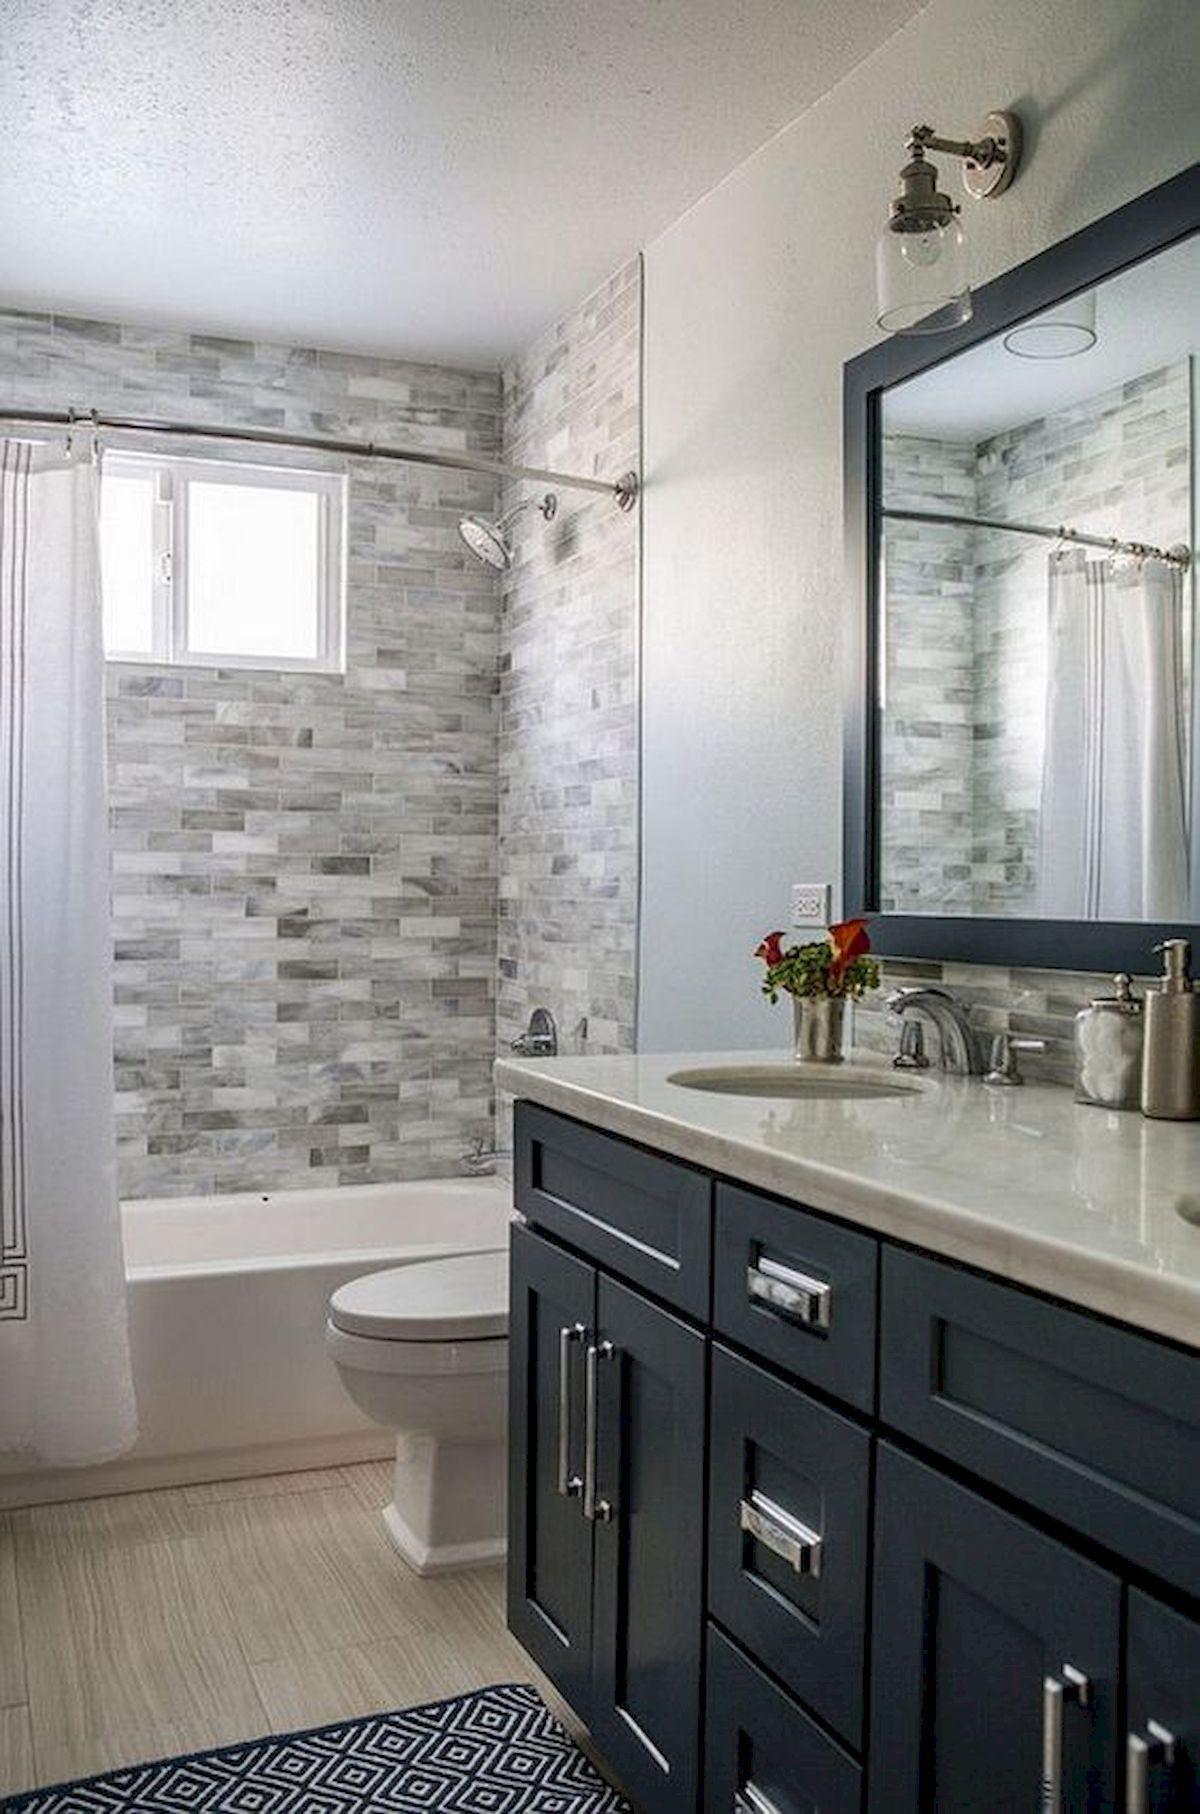 60 Elegant Small Master Bathroom Remodel Ideas 42 With Images Bathroom Remodel Master Small Bathroom Remodel Small Bathroom Decor